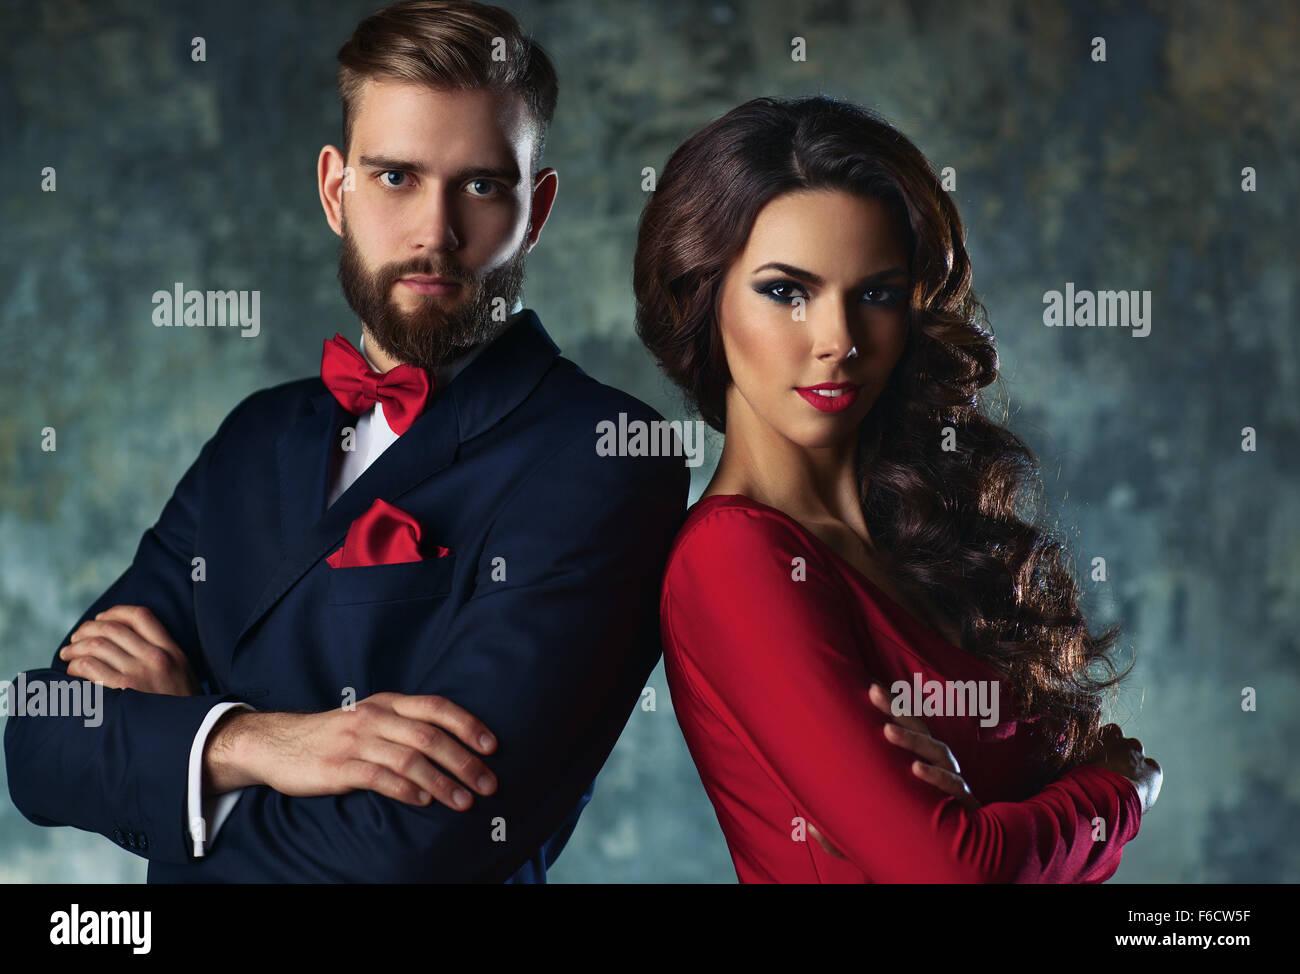 db44e55151157 Young elegant couple in evening dress portrait. Standing shoulder to  shoulder.